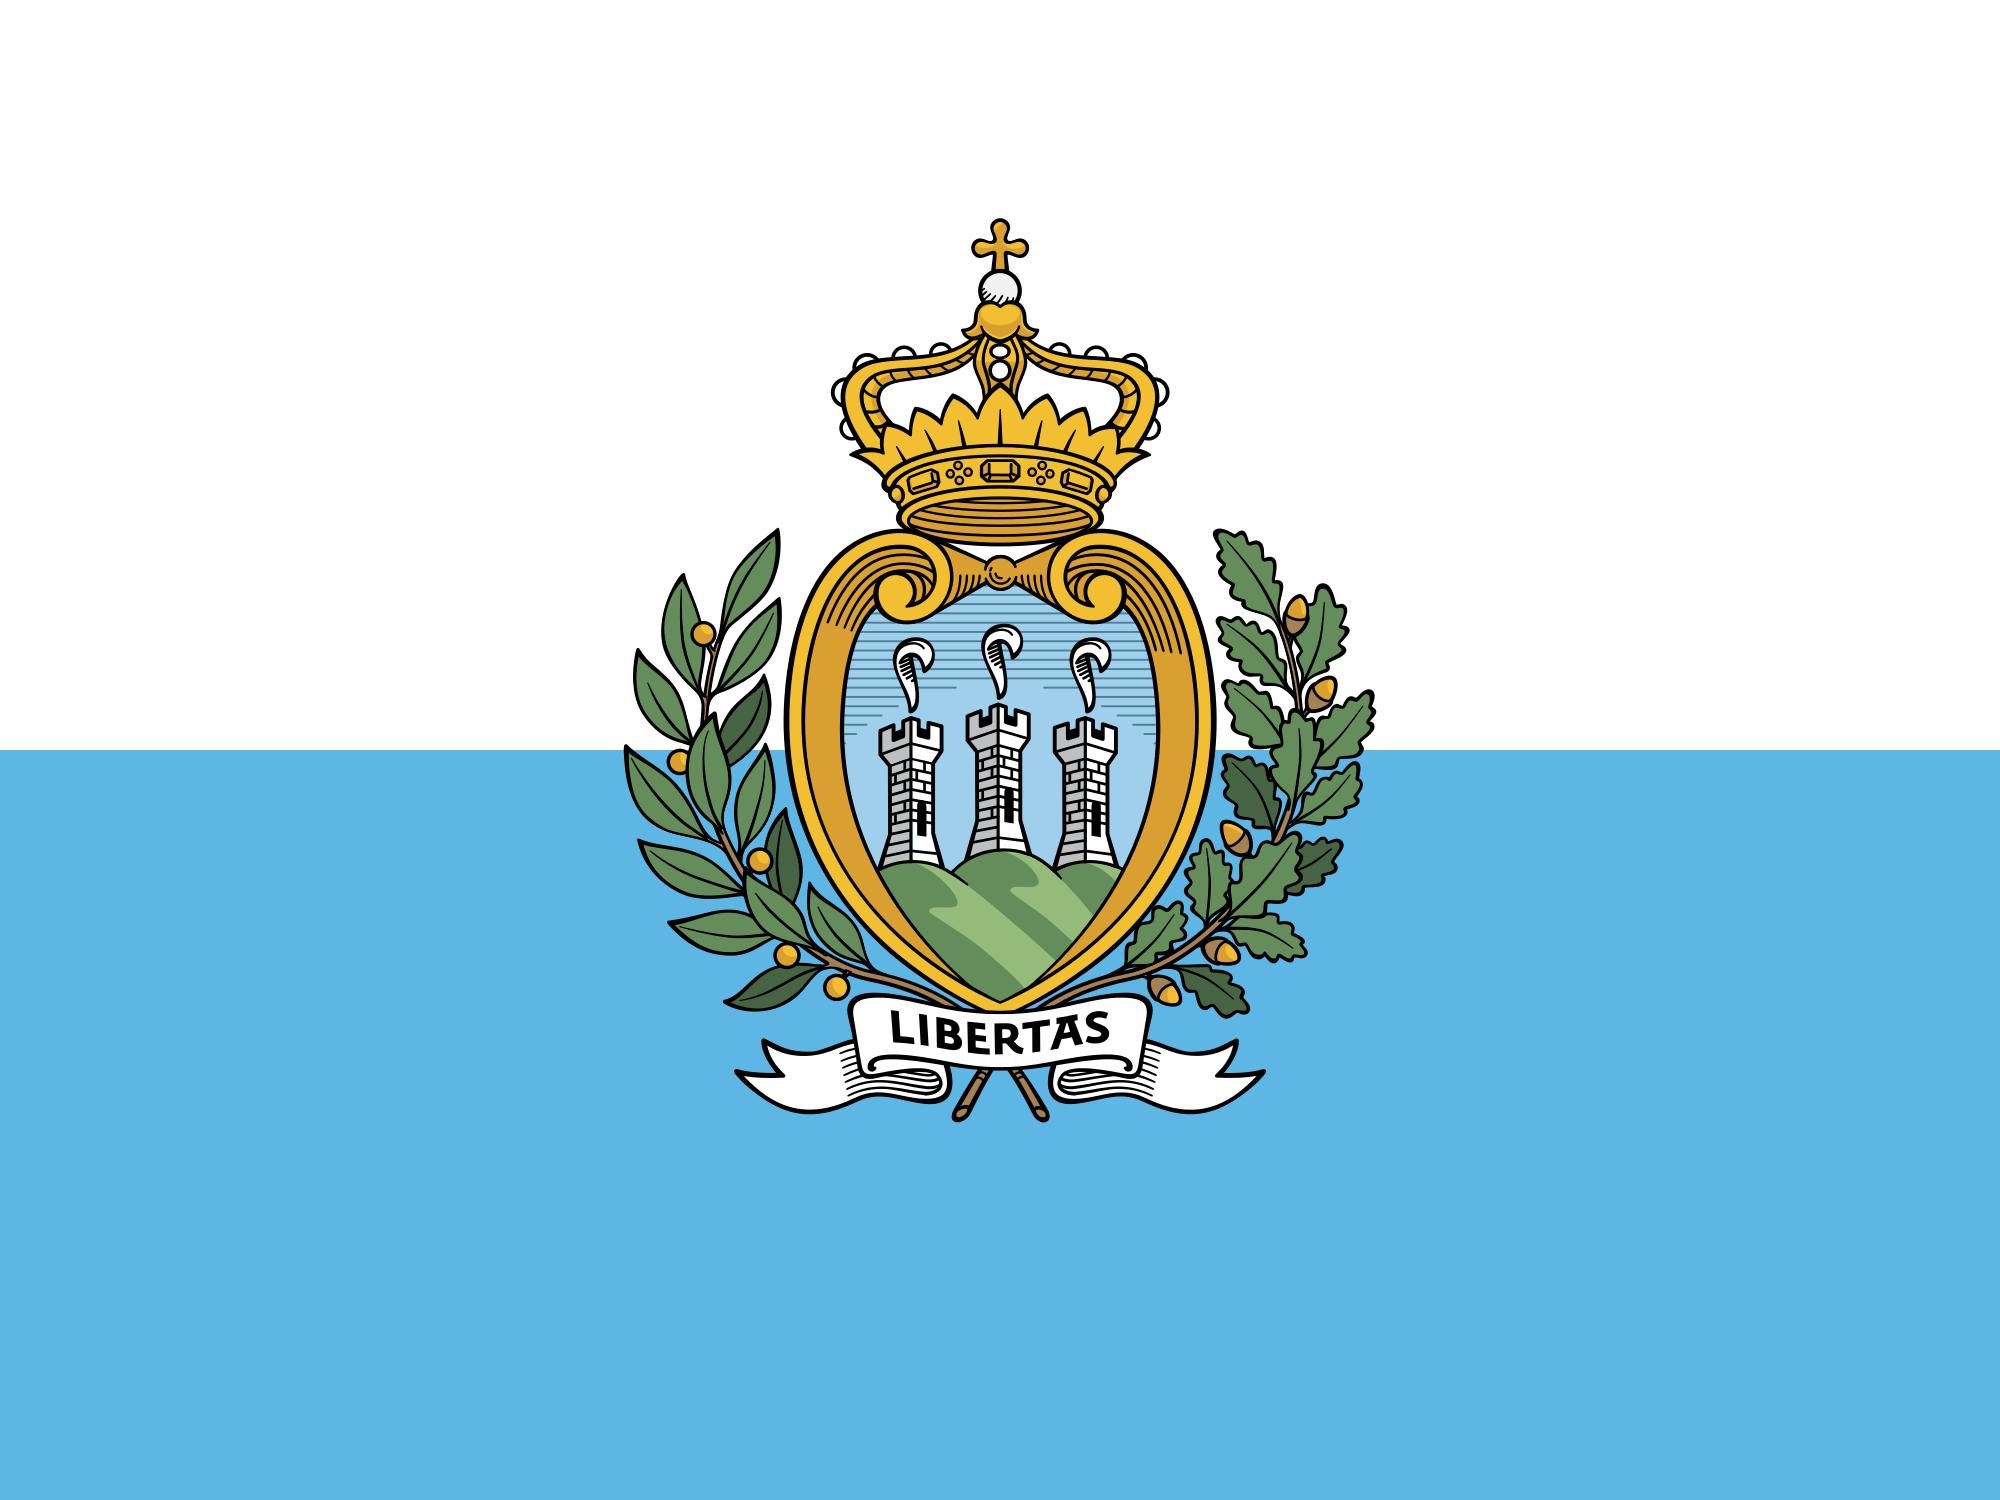 flagofsanmarinosvg.png